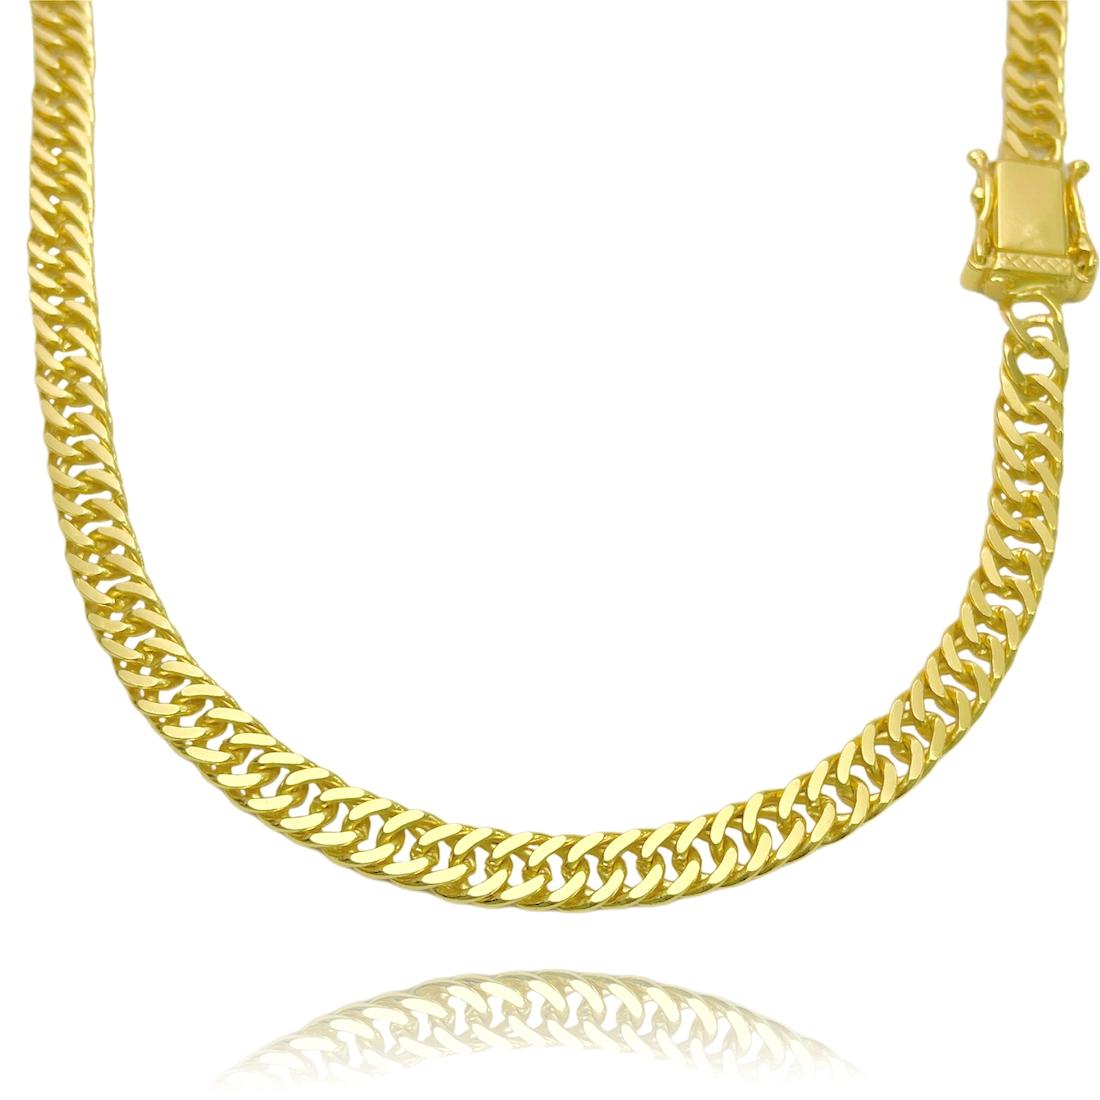 Corrente Double Grumet Diamantada 5,8m 70cm (34,8g) (Fecho Gaveta Duplo) (Banho Ouro 24k)